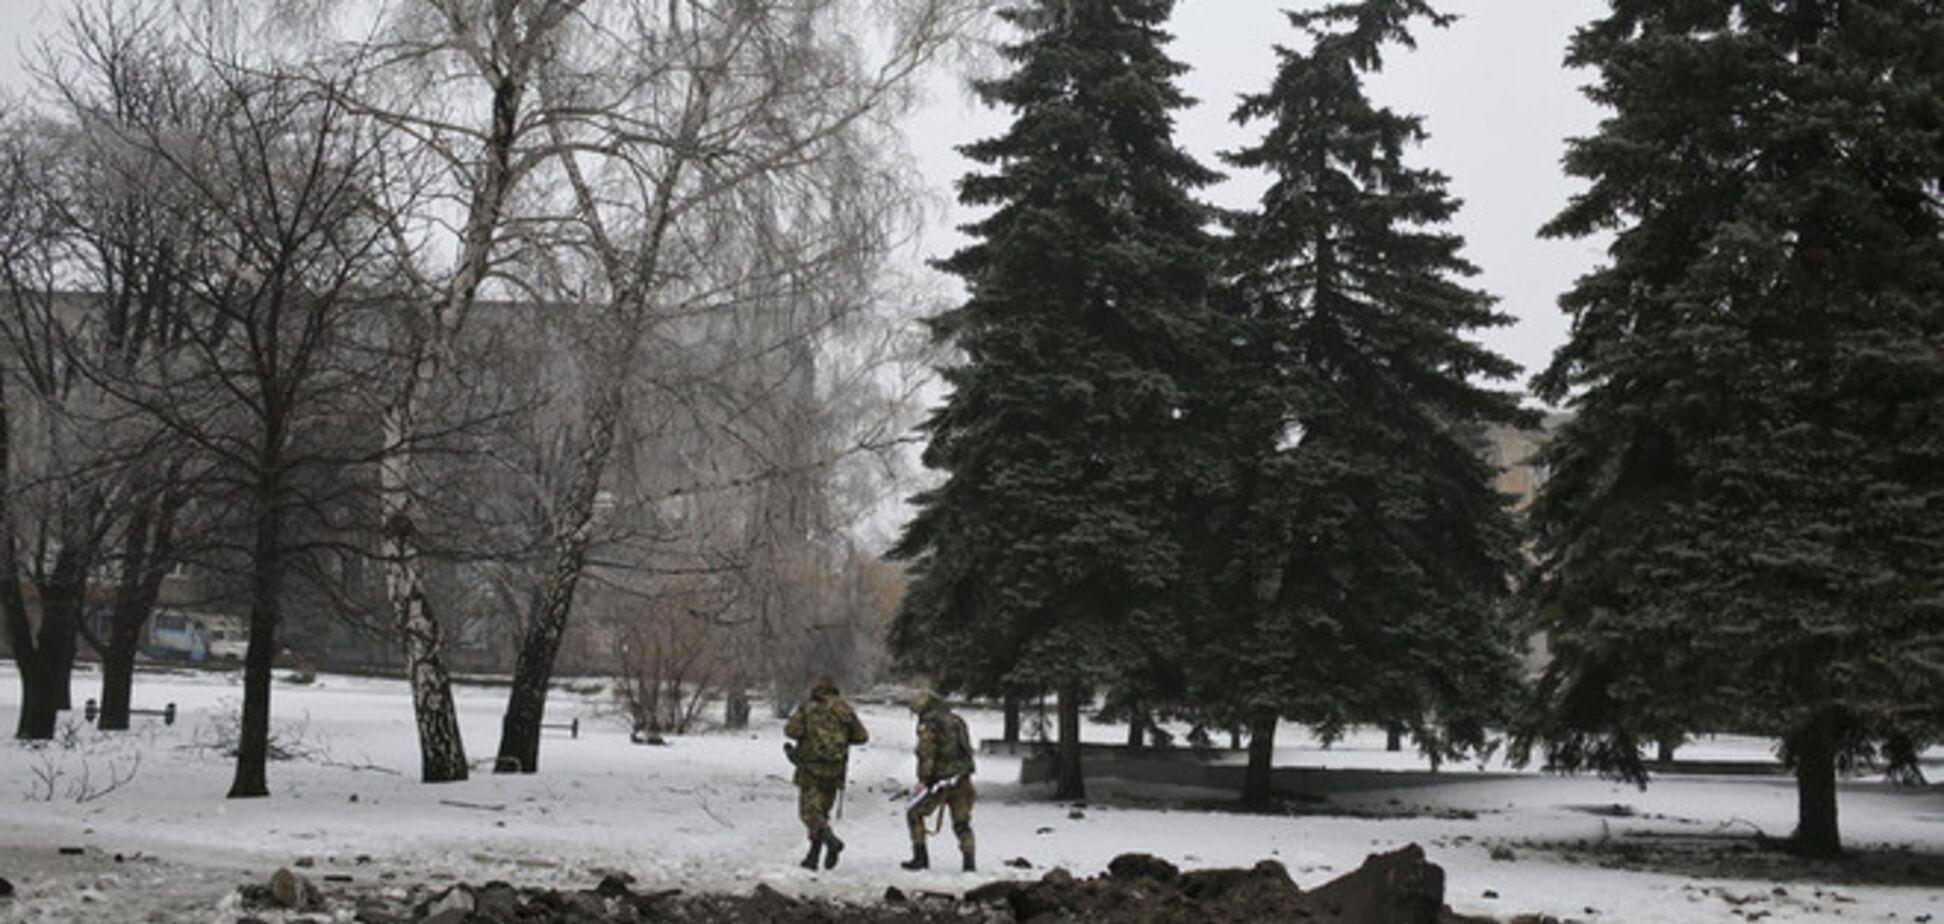 В районе Дебальцево сложилась напряженная ситуация - штаб АТО